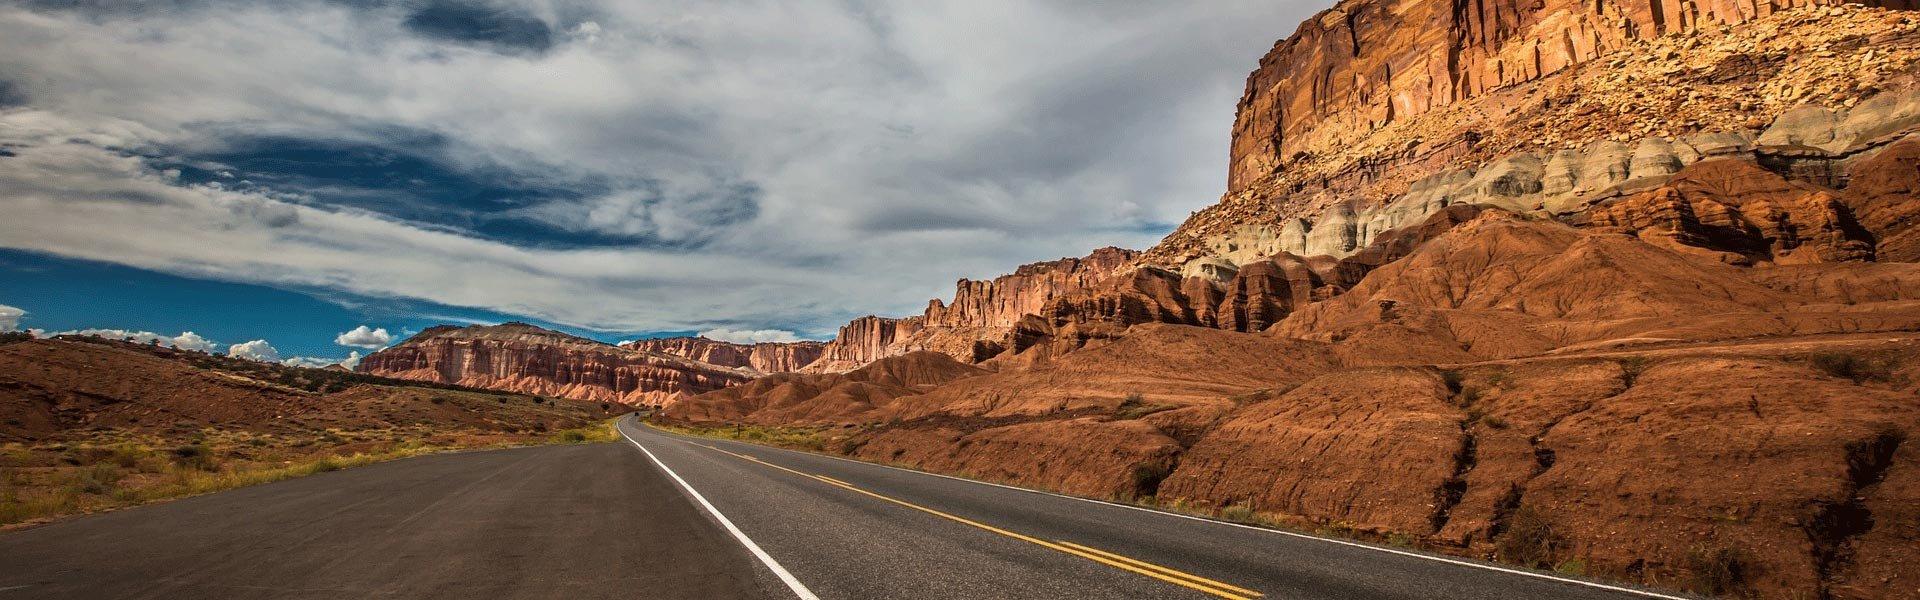 banner Roadtrip Amerika